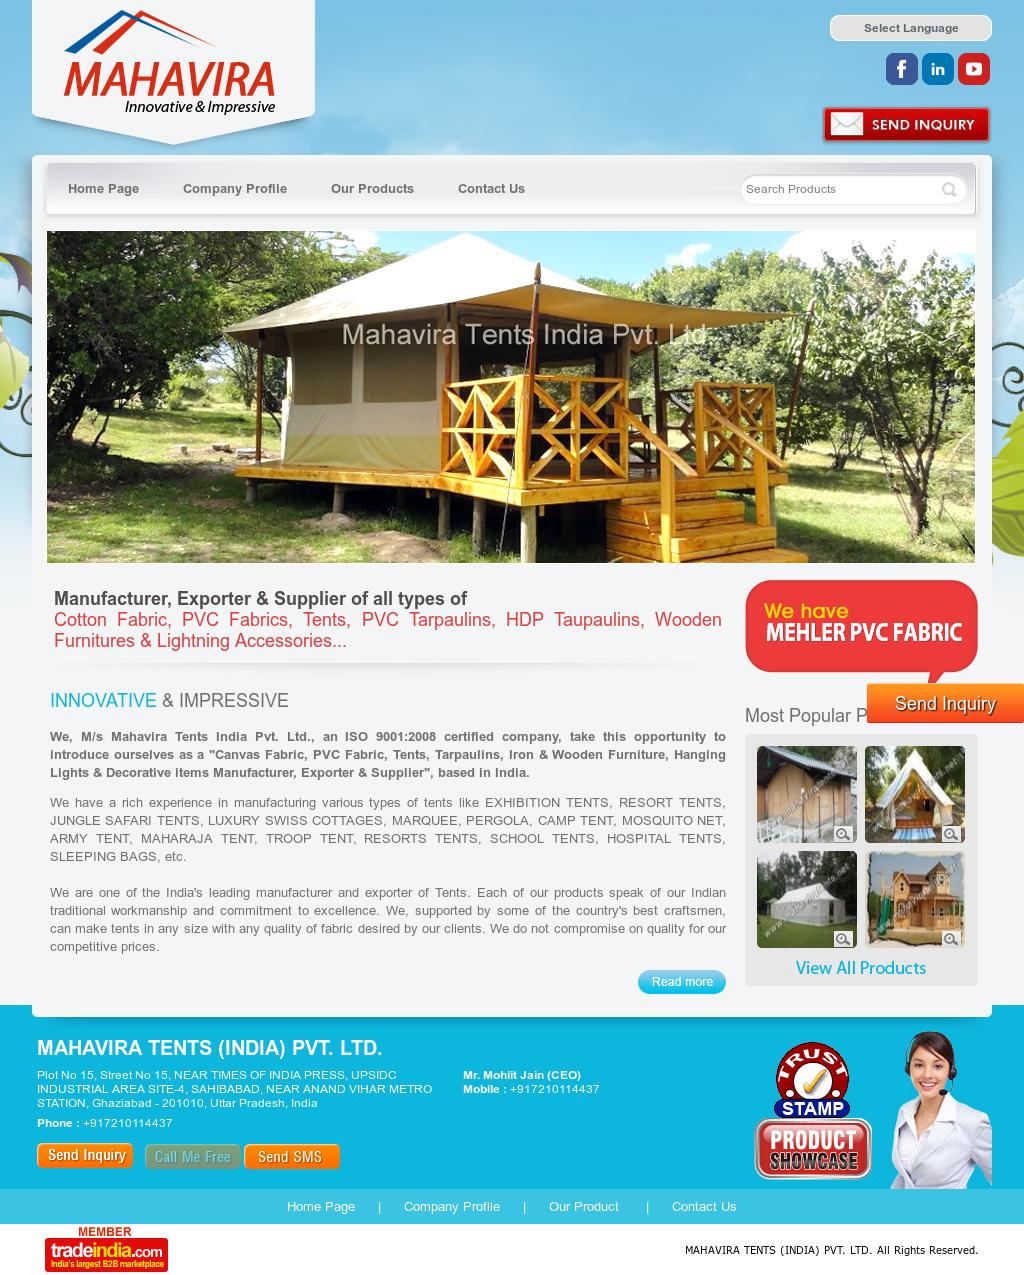 Mahavira Tents (India) Competitors, Revenue and Employees - Owler